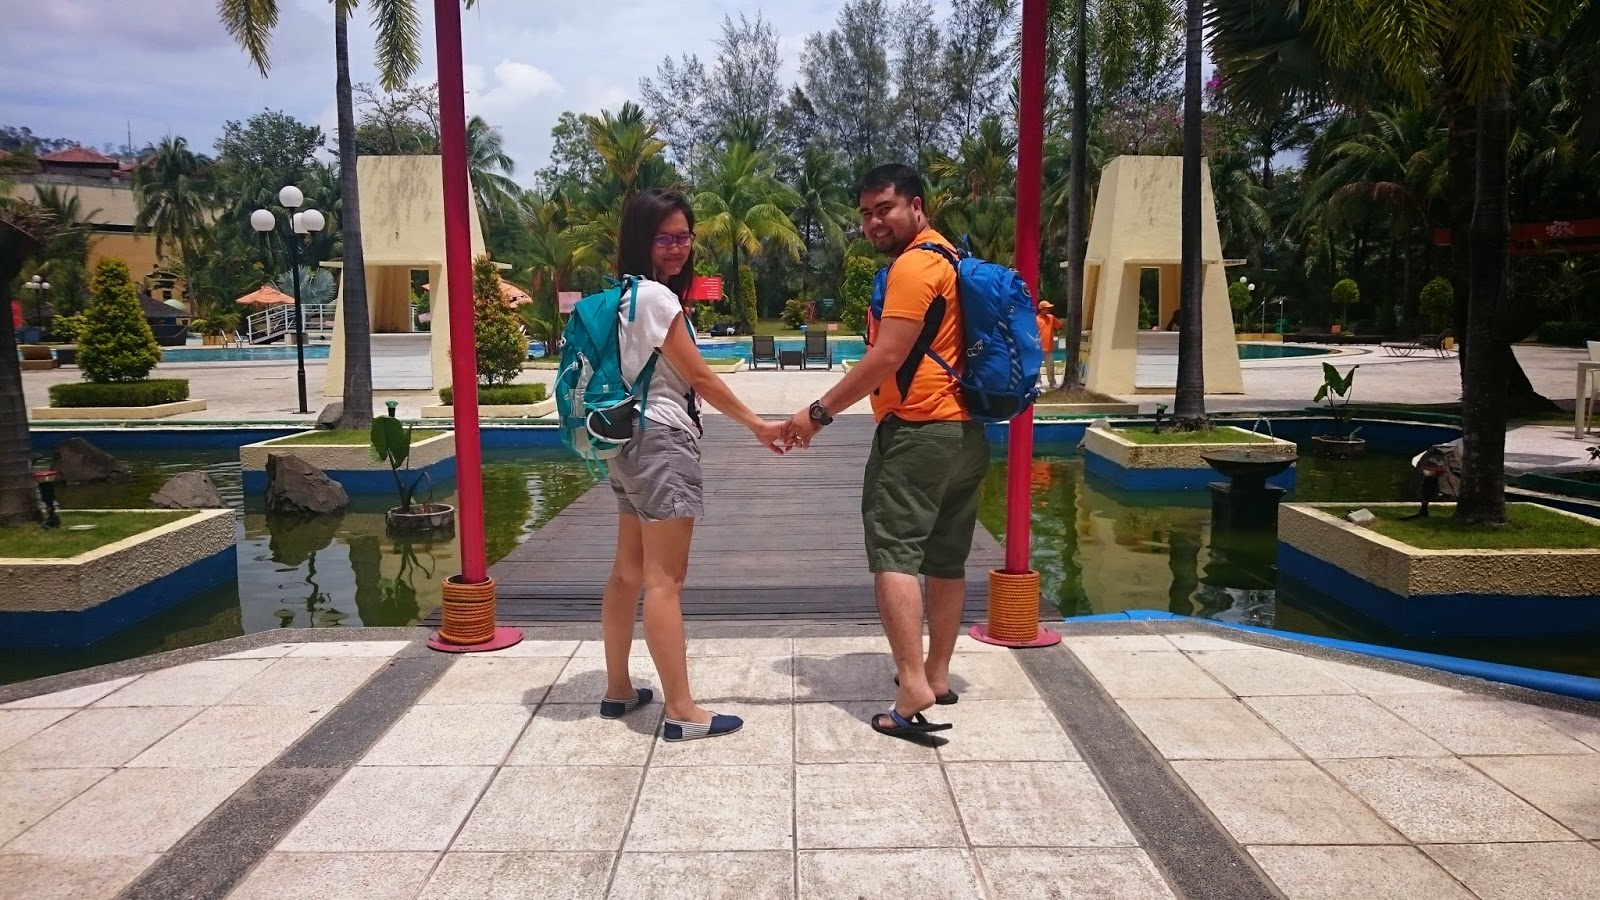 3 Days 2 Nights Trip at Harris Resort Batam (Indonesia